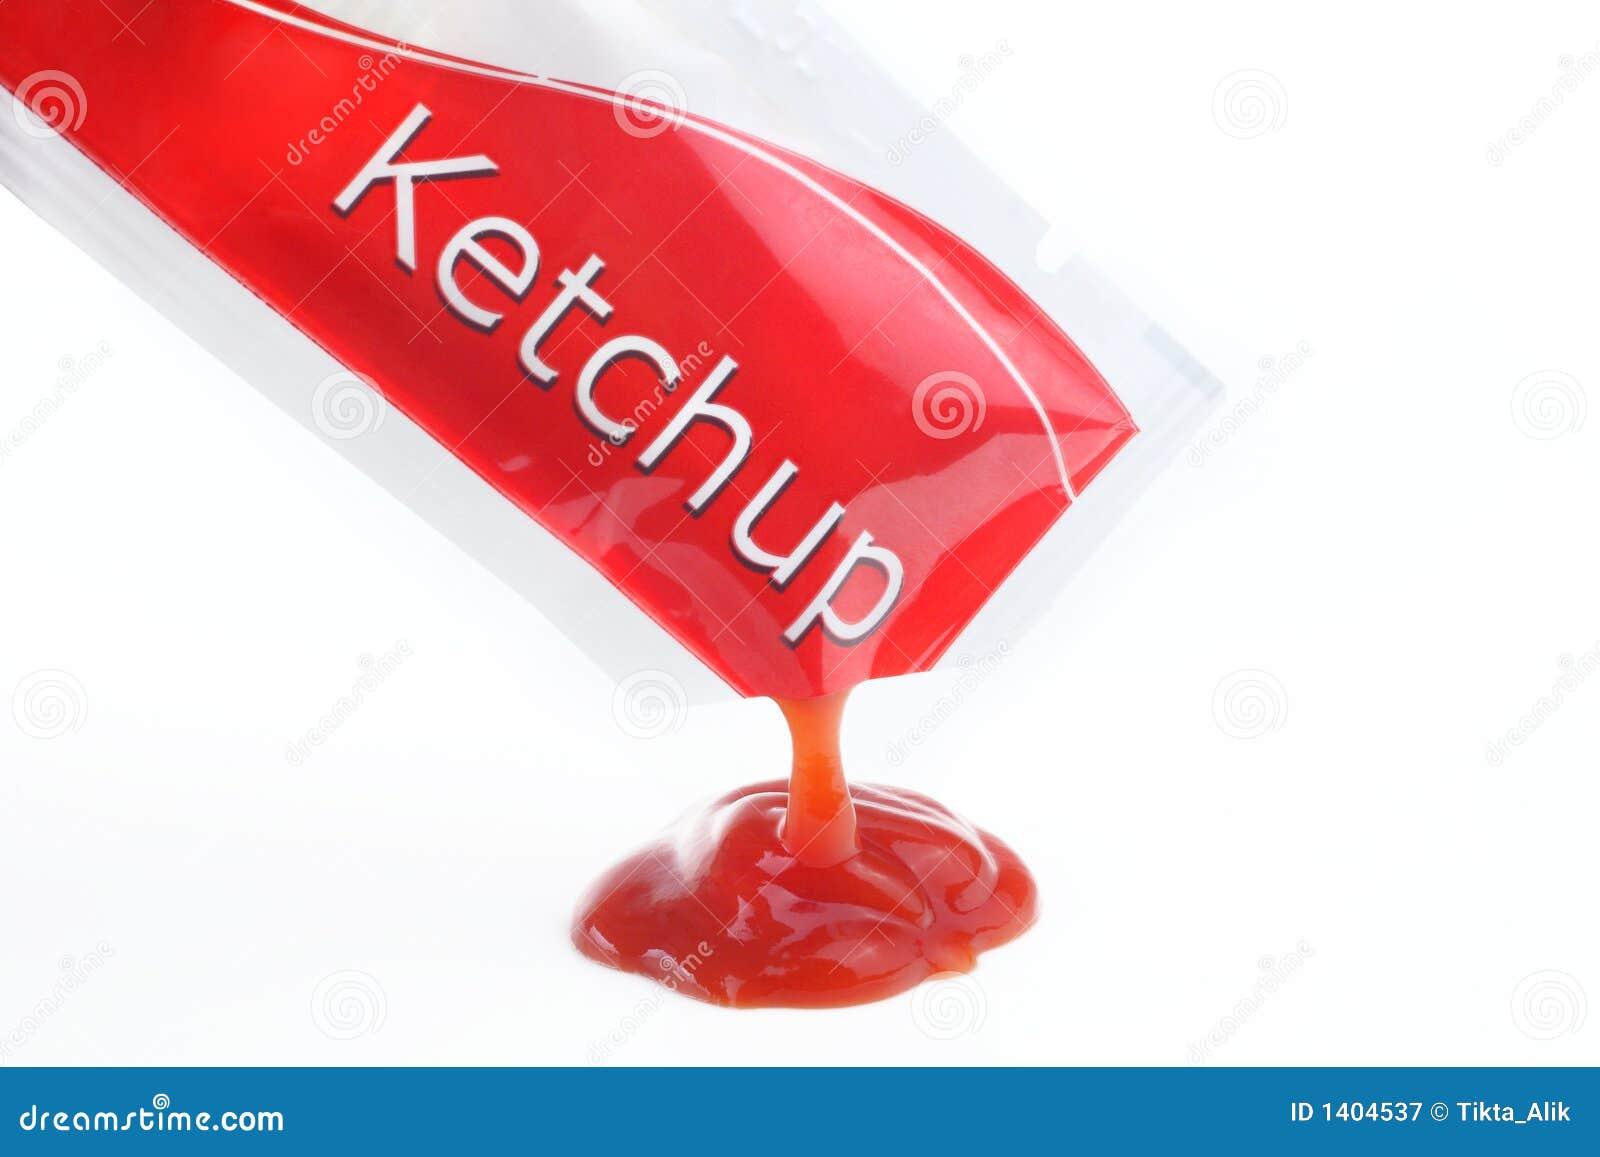 Ketchup Packet Royalty Free Stock Photography - Image: 1404537